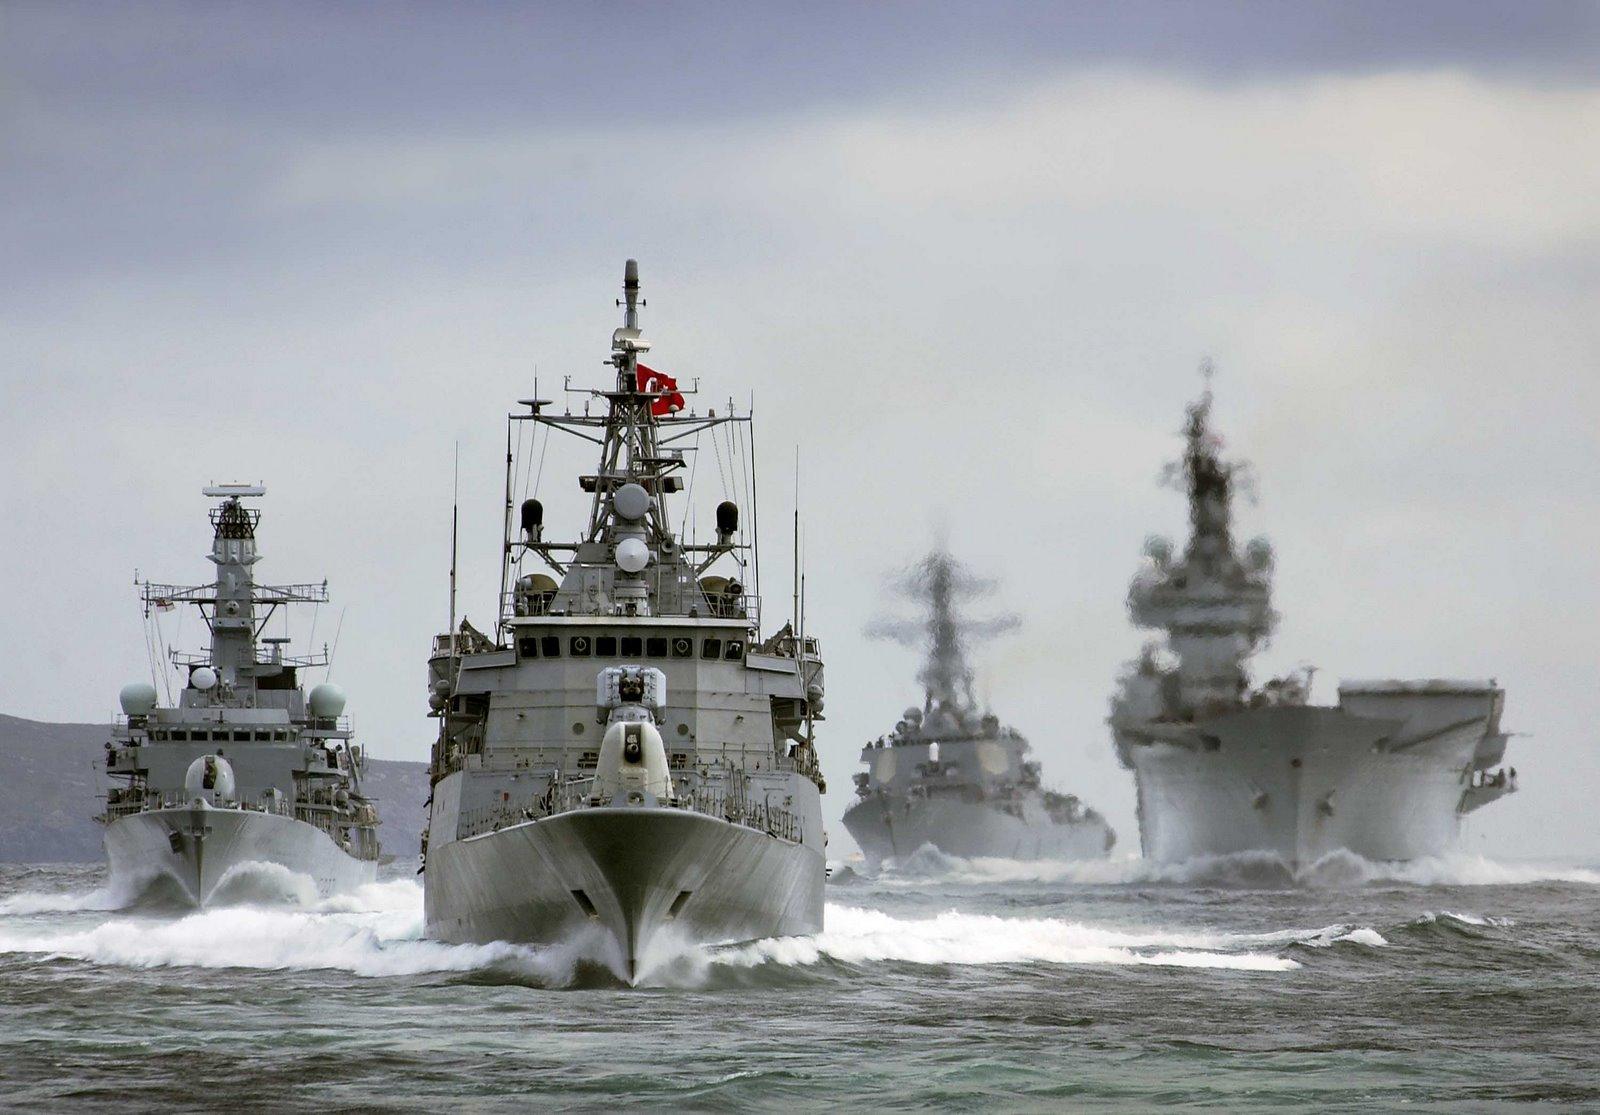 Fokaides: 'Turkey's new provocative action should concern EU'